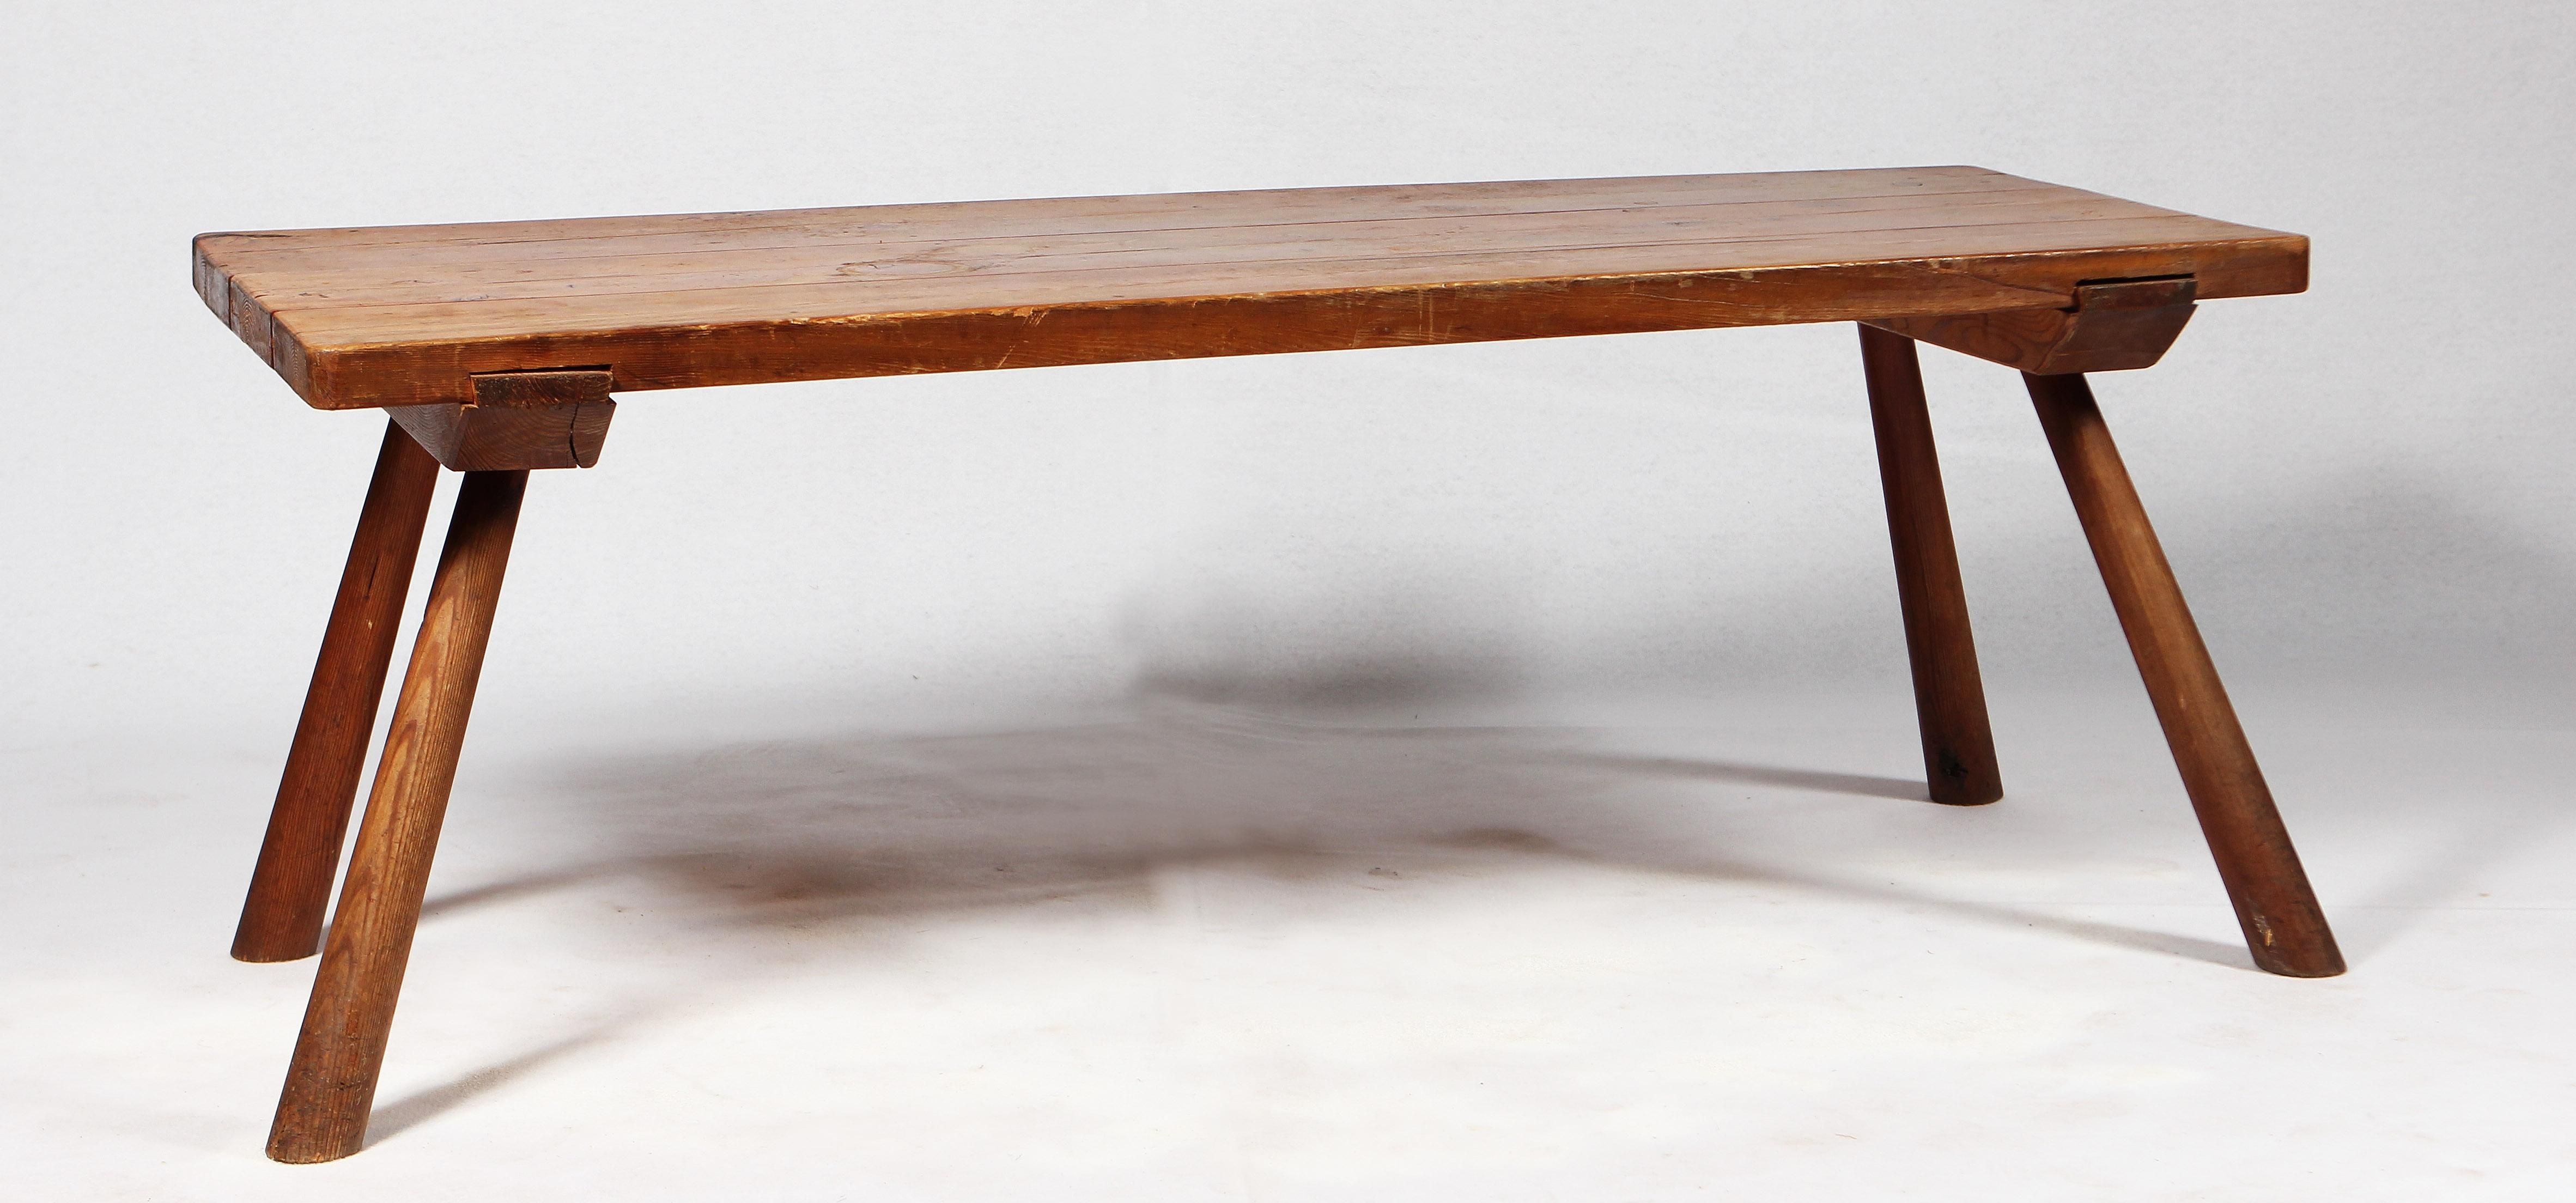 Edoardo Gellner table http://www.anca-aste.it/public/120/102.jpg